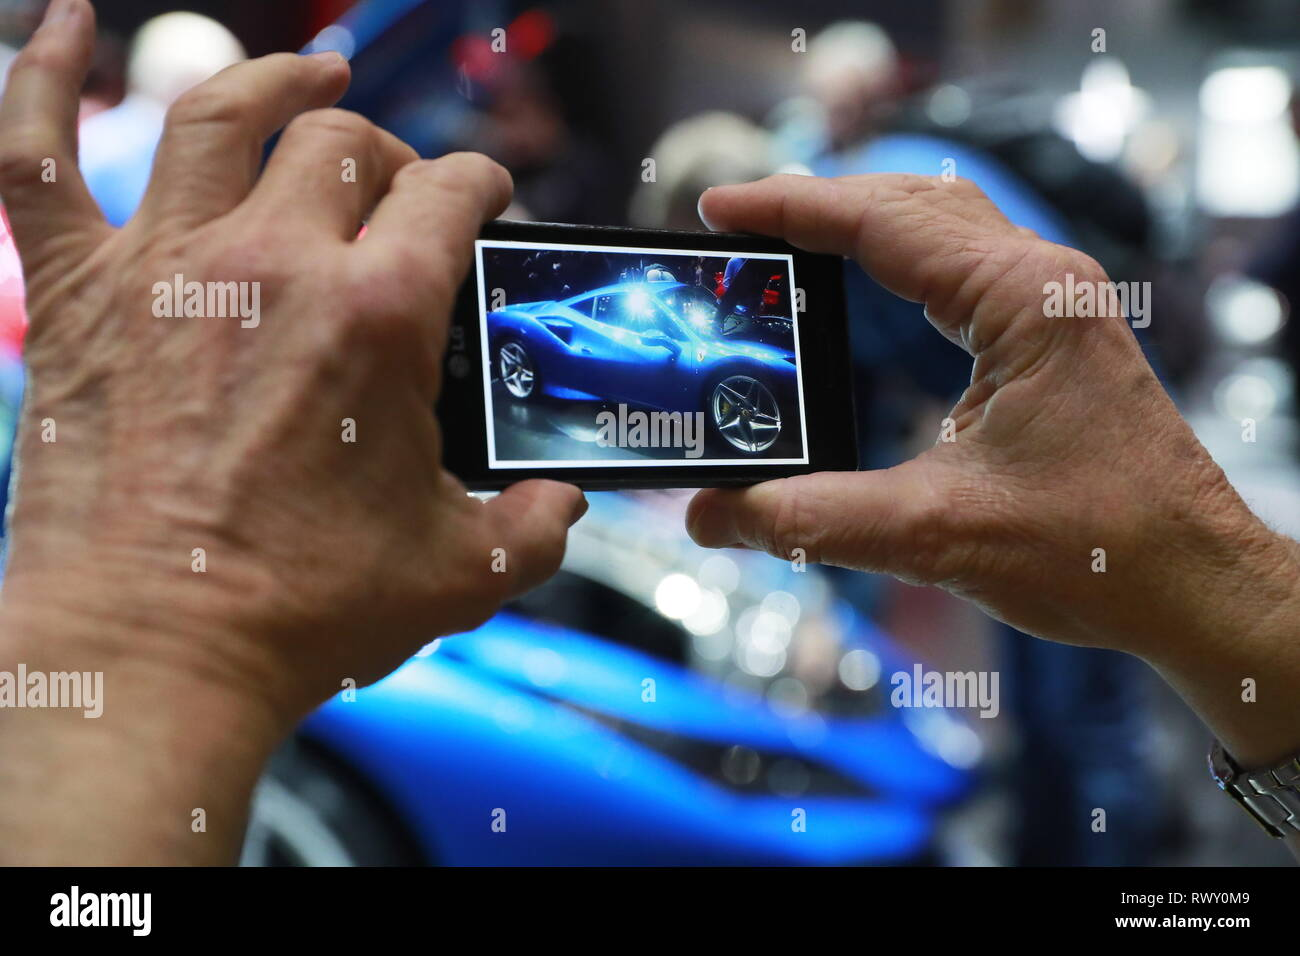 Geneva, Switzerland. 07th Mar, 2019. GENEVA, SWITZERLAND - MARCH 7, 2019: The Ferrari stand at the 89th Geneva International Motor Show. Sergei Fadeichev/TASS Credit: ITAR-TASS News Agency/Alamy Live News - Stock Image